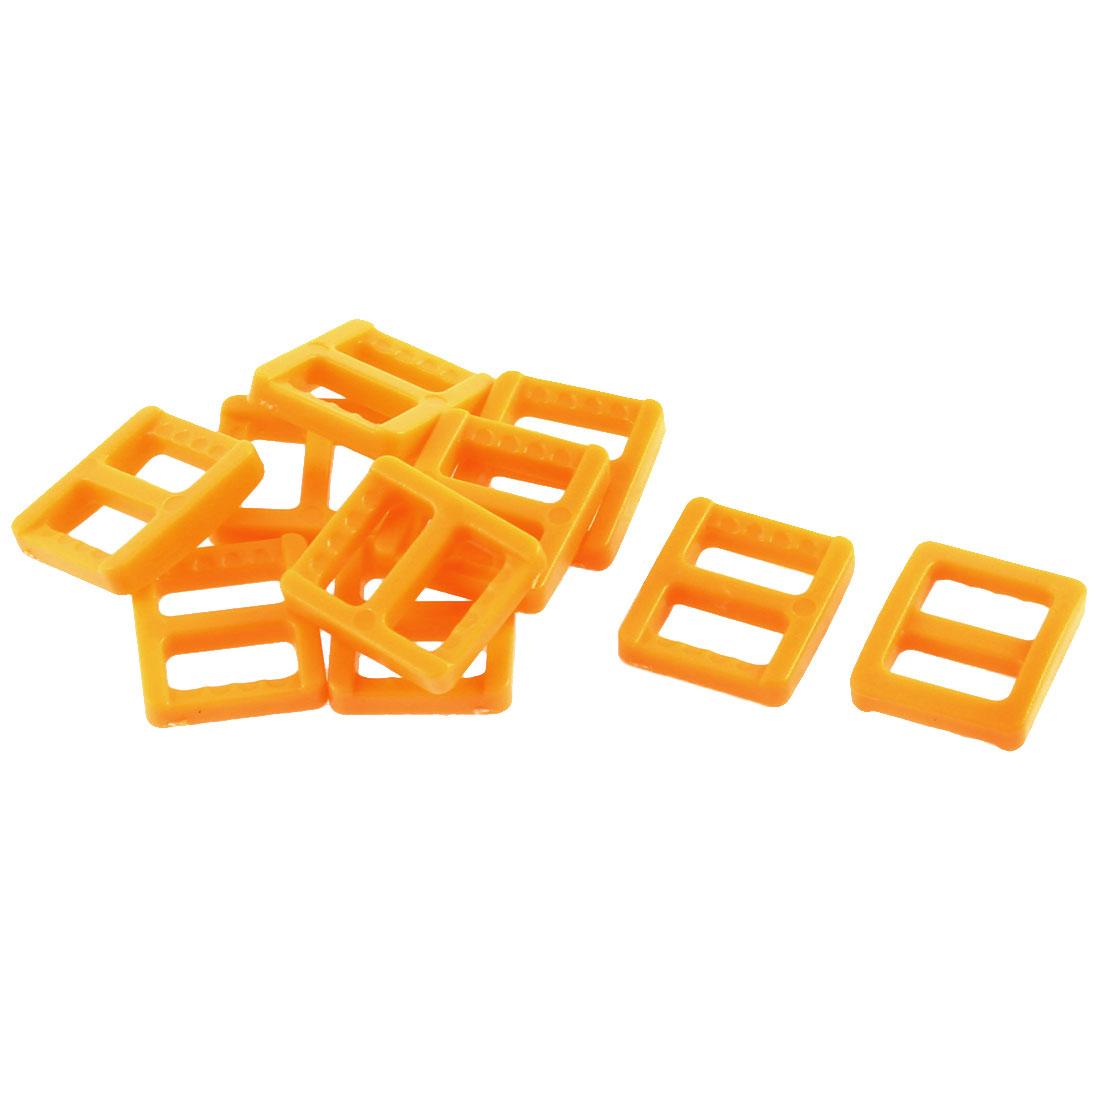 Plastic Tri Glide Buckles Yellow 11mm Strap Width 10Pcs